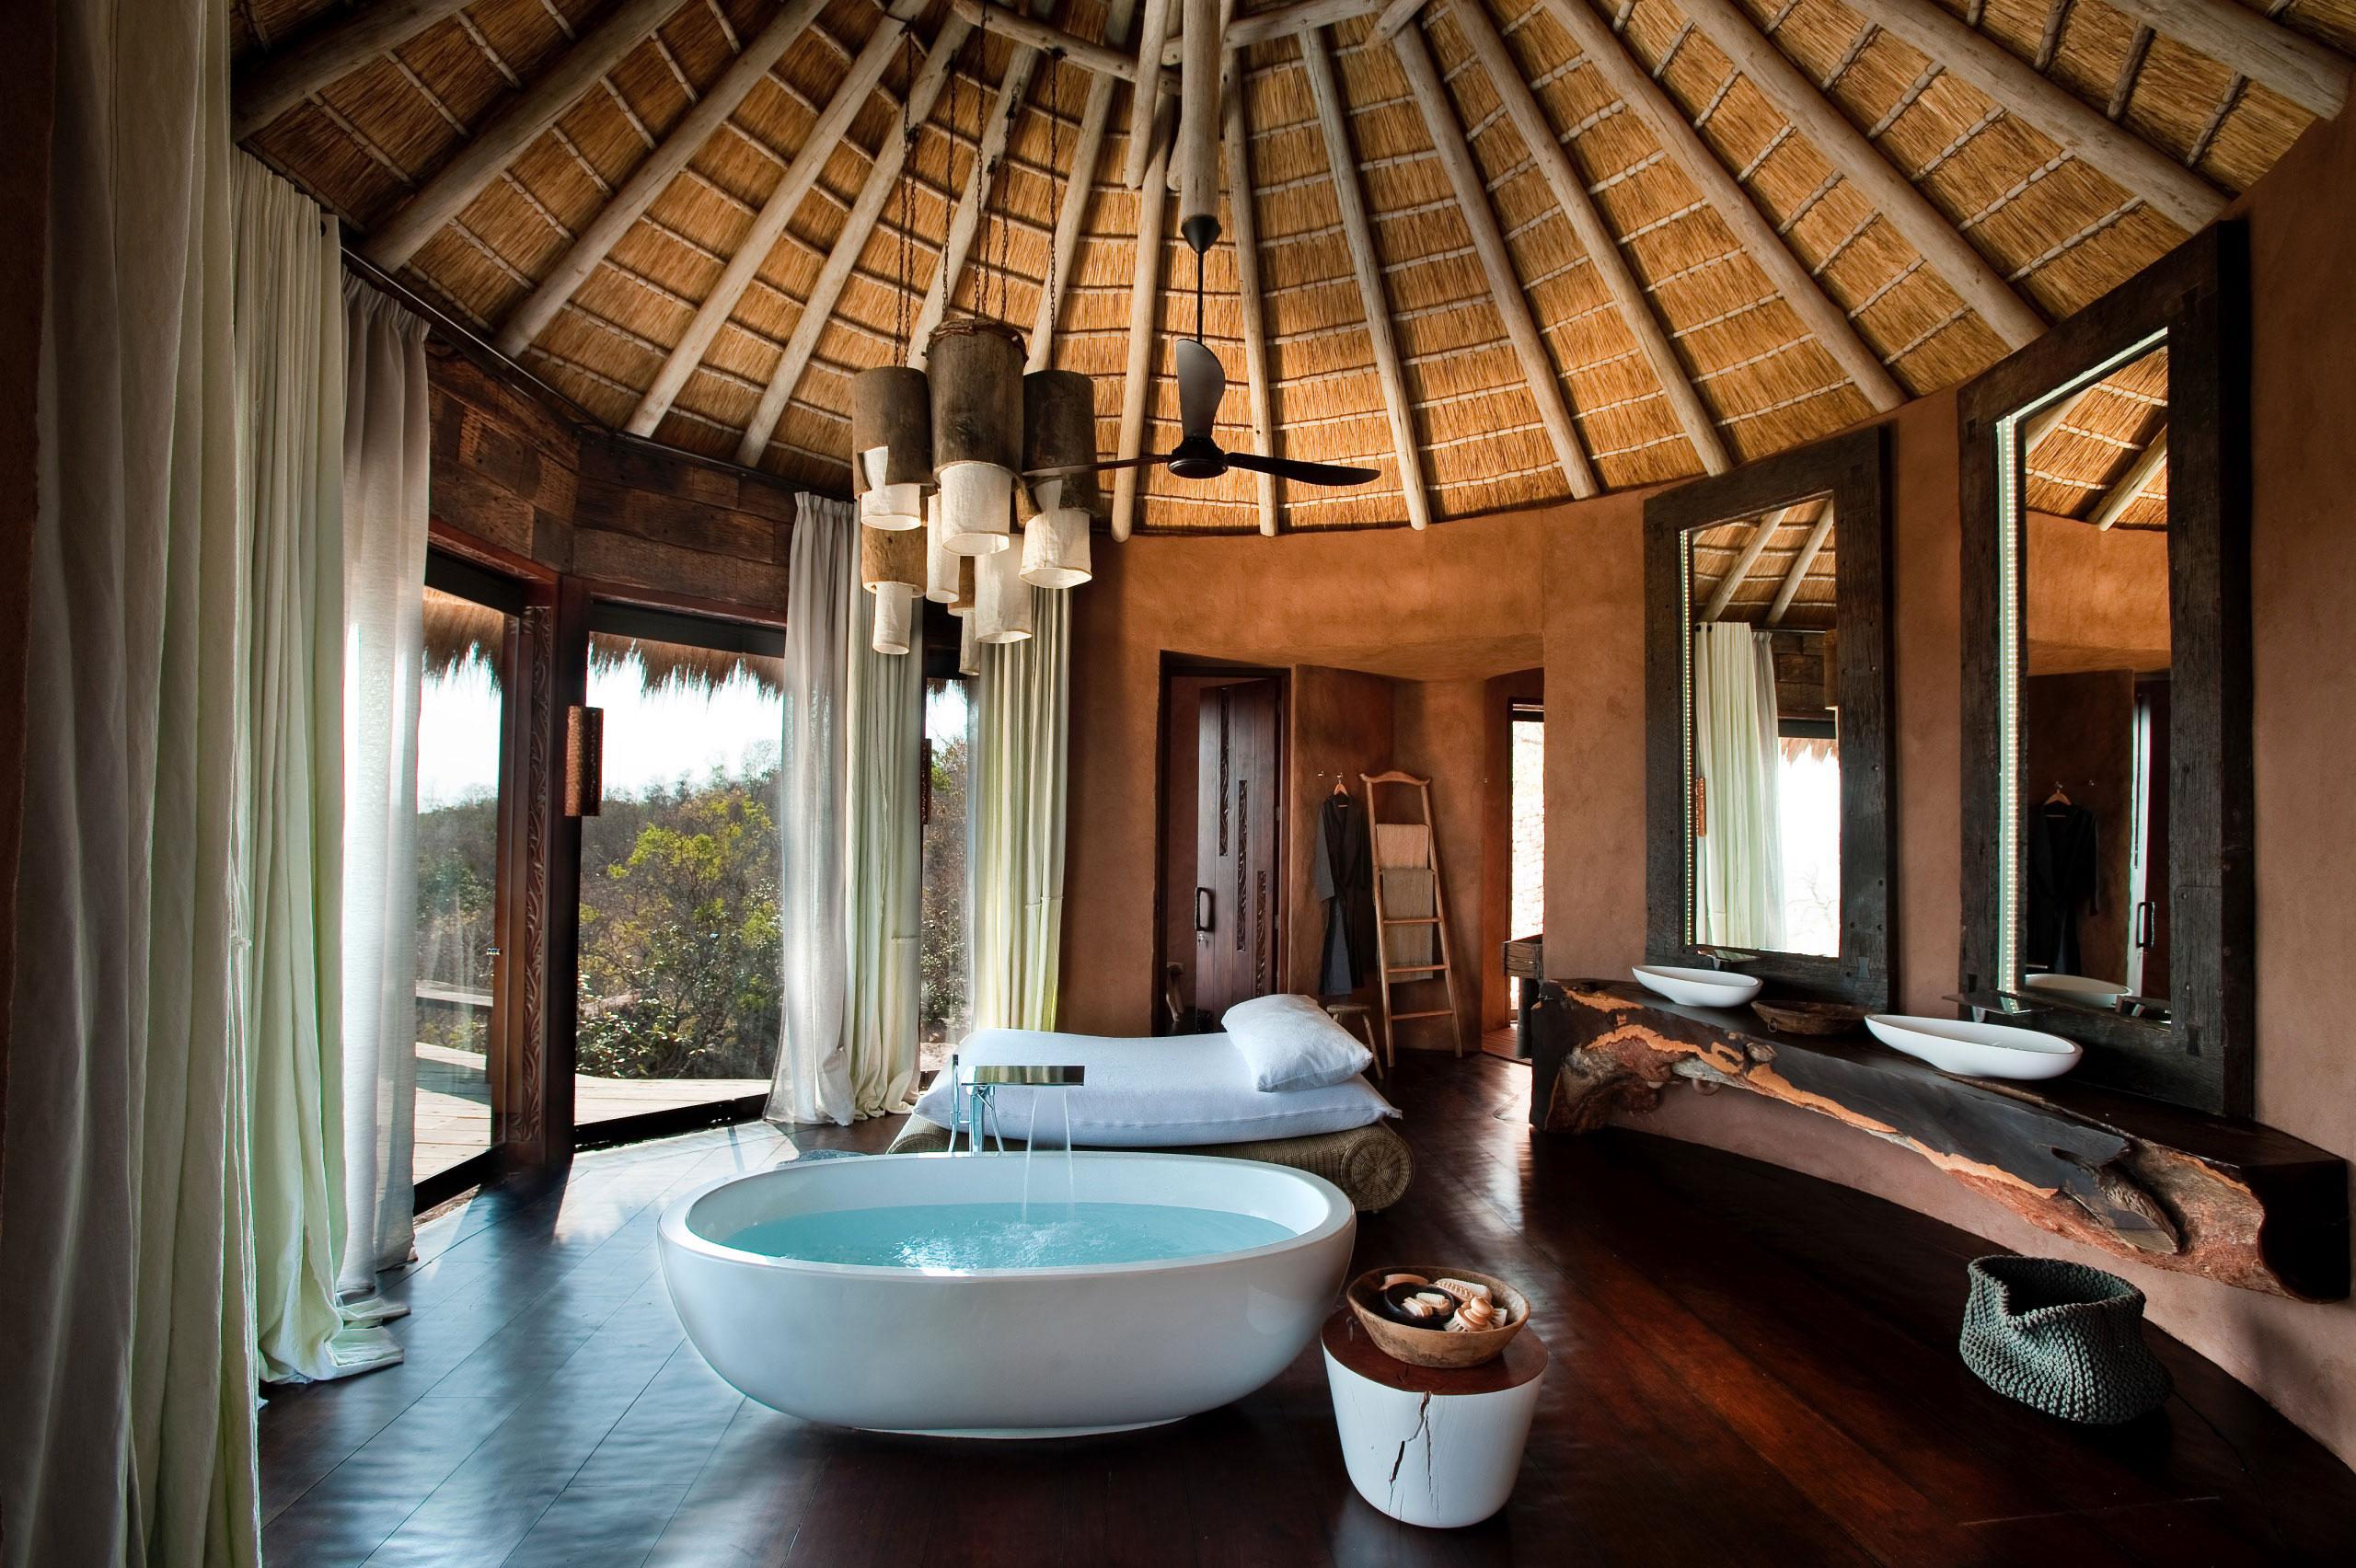 Alojamientos en Sudáfrica que nos han Sorprendido enkosi africa sudafrica leobo safari observatory 2